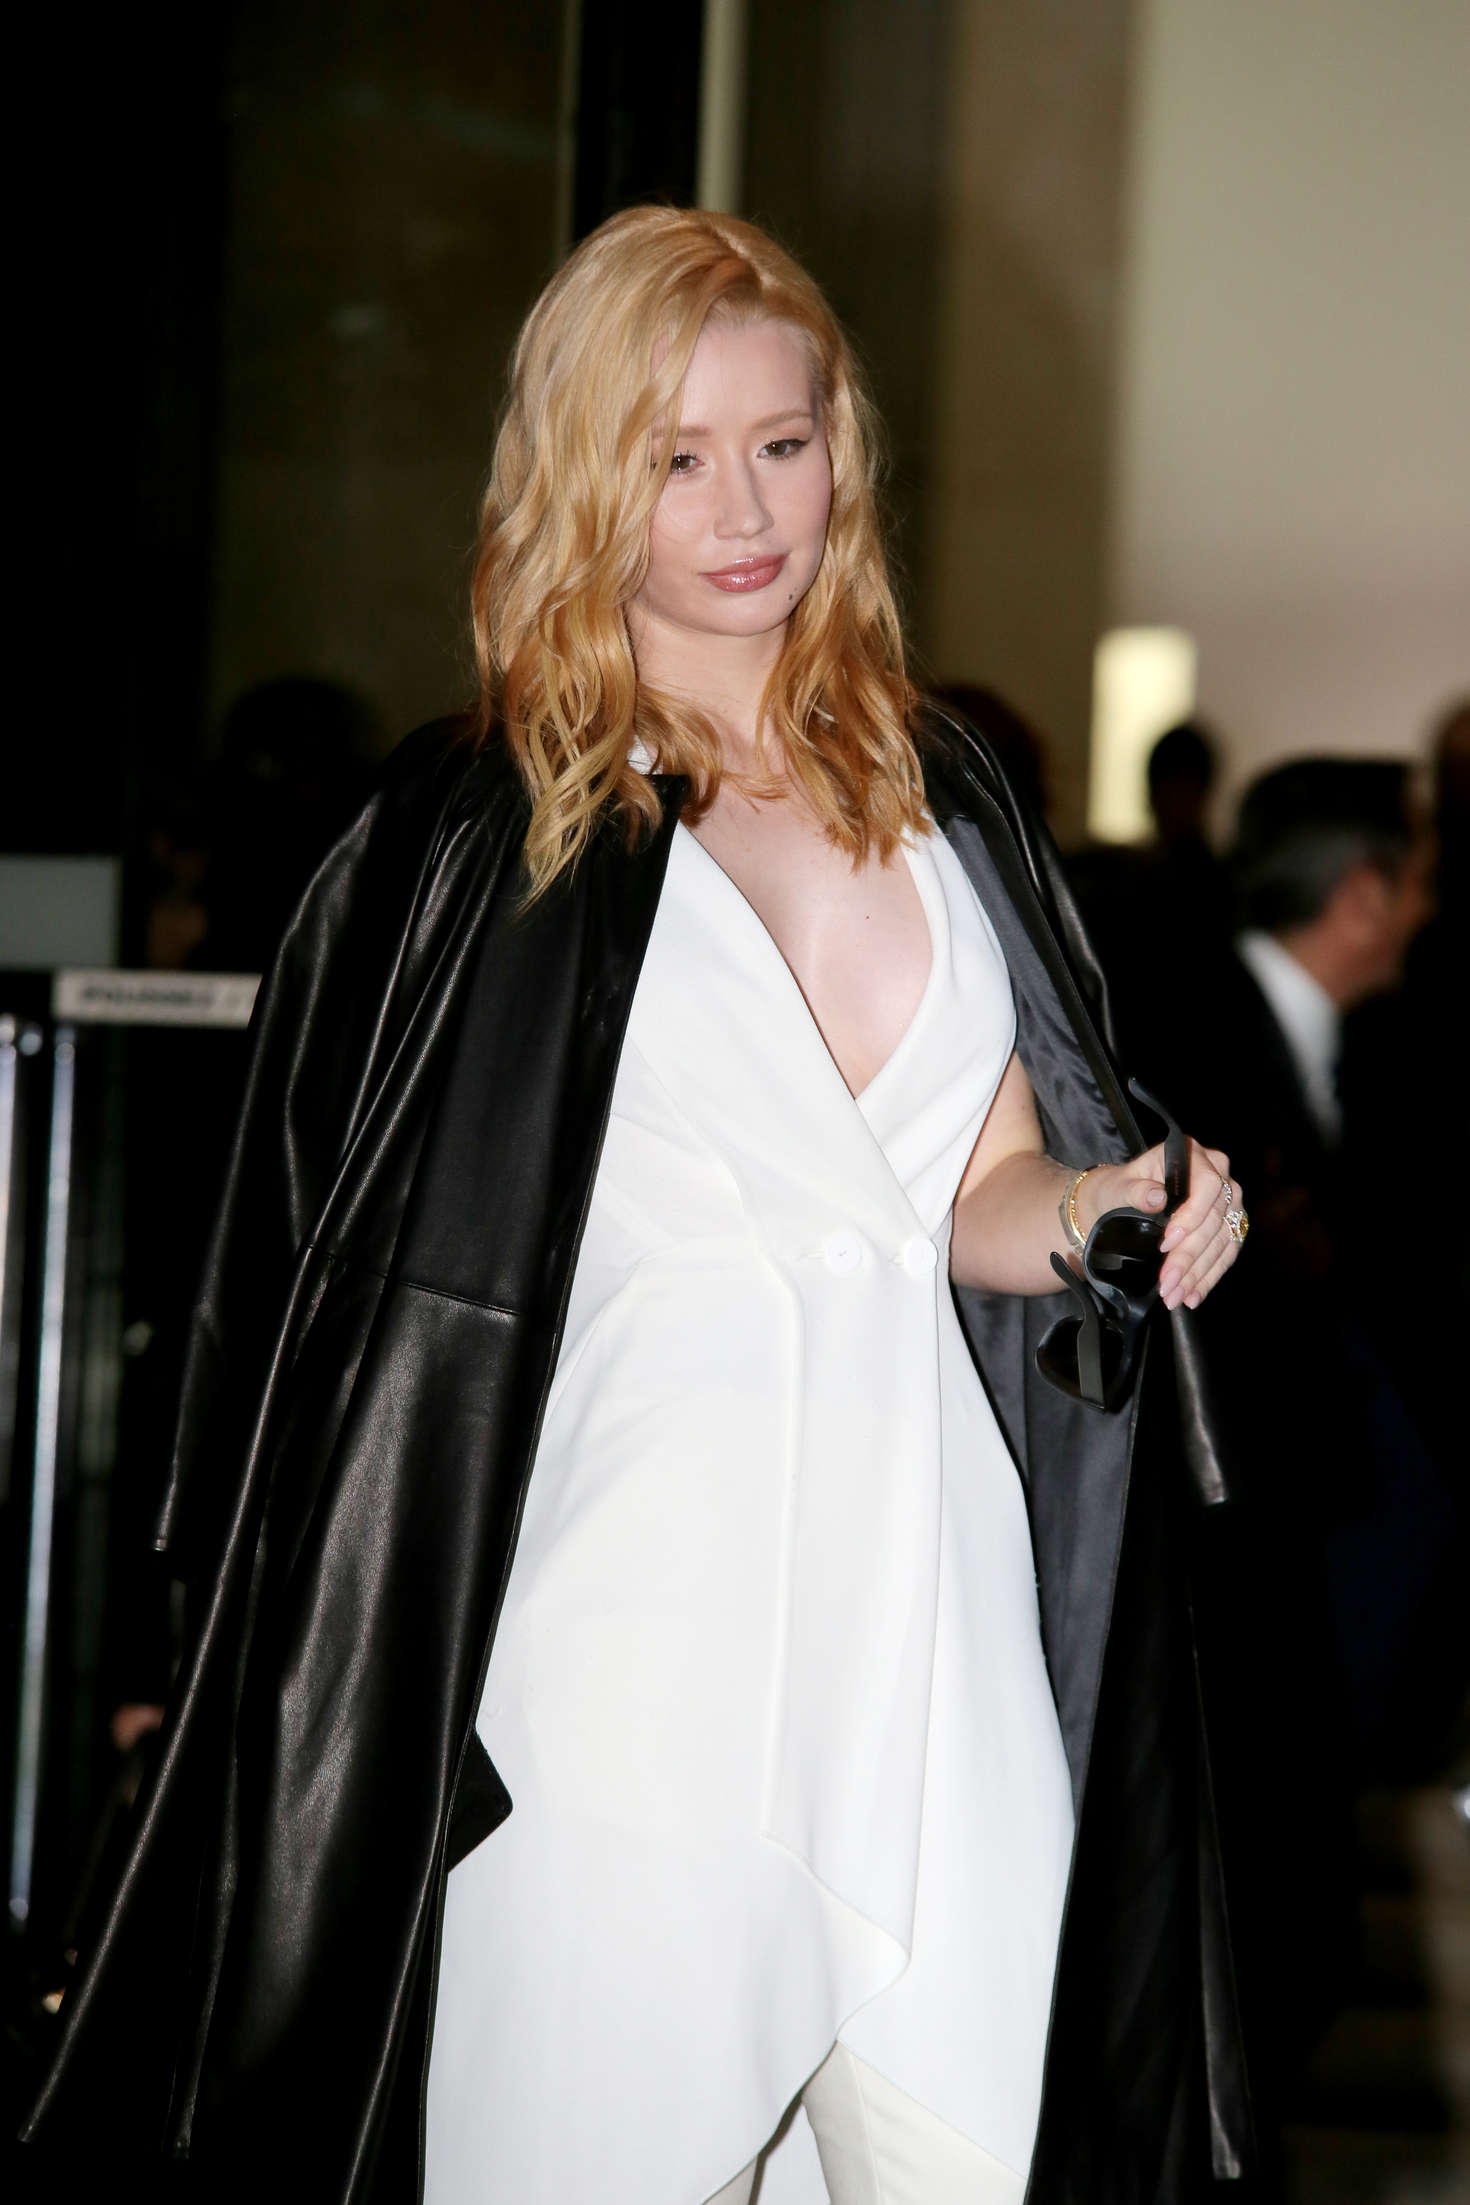 Iggy Azalea Arrivals at Giorgio Armani Fashion Show Spring Summer 2016 in Paris